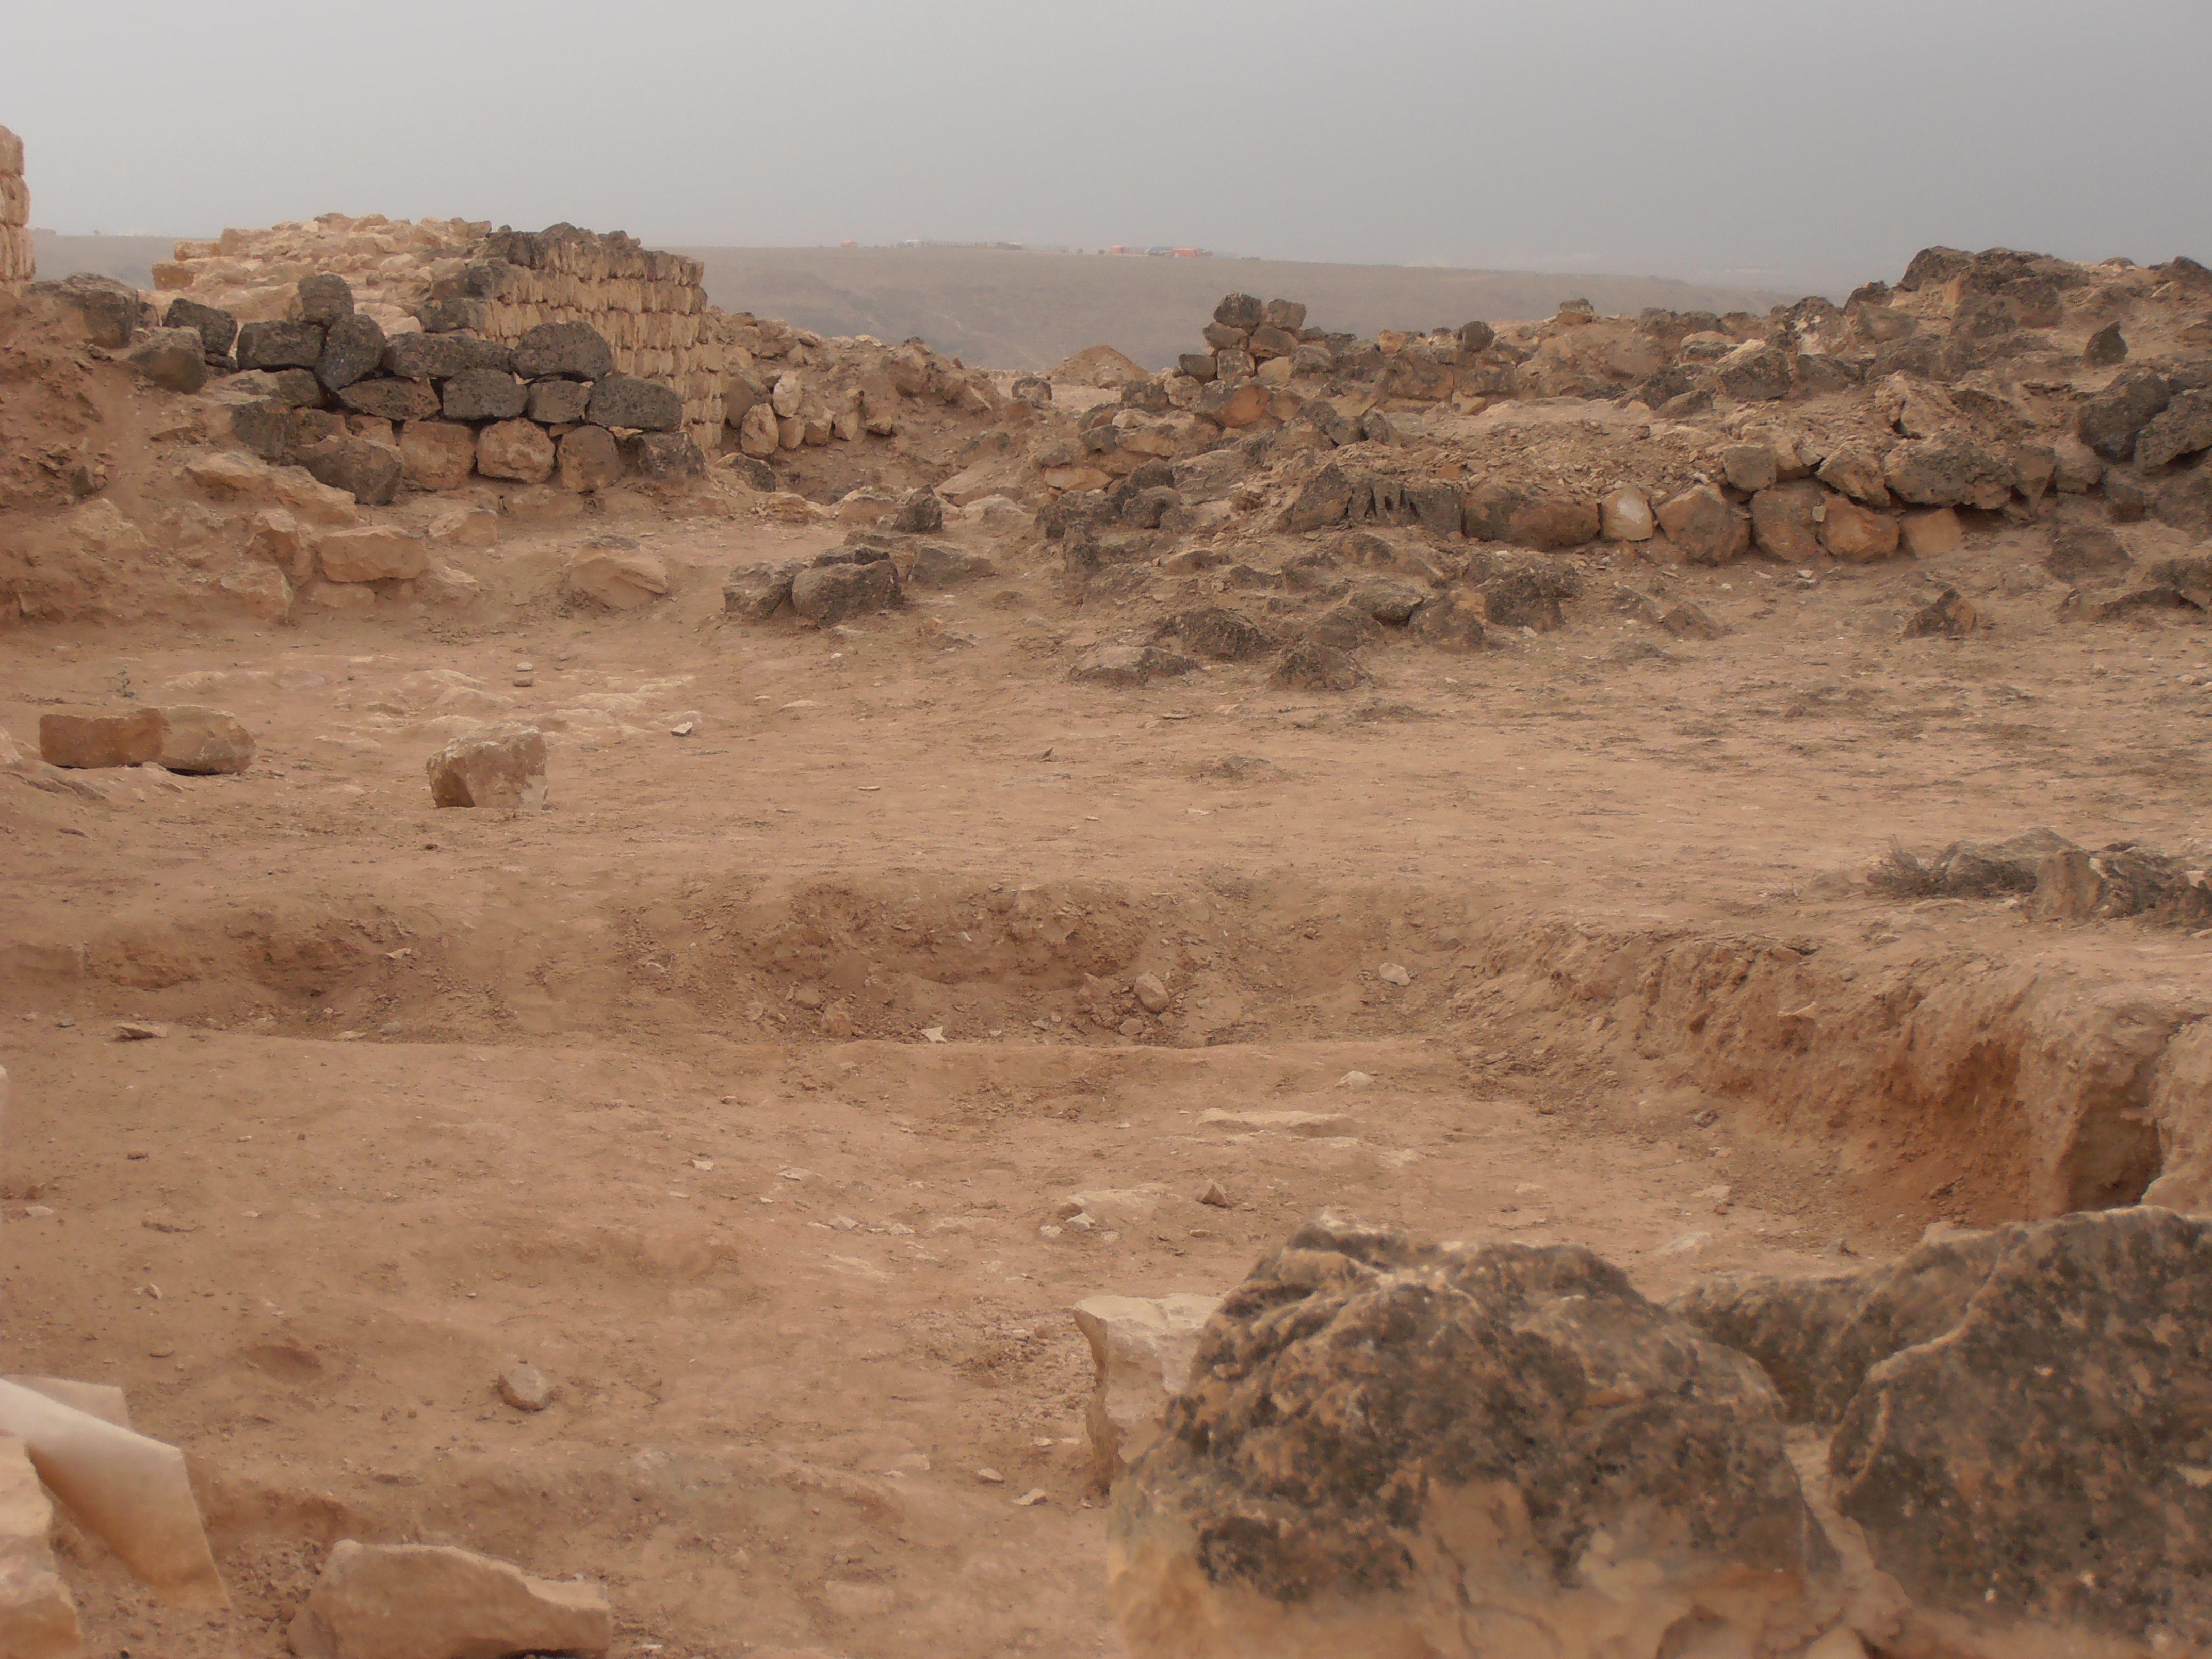 Queen of Sheba's palace in Salallah, Oman.